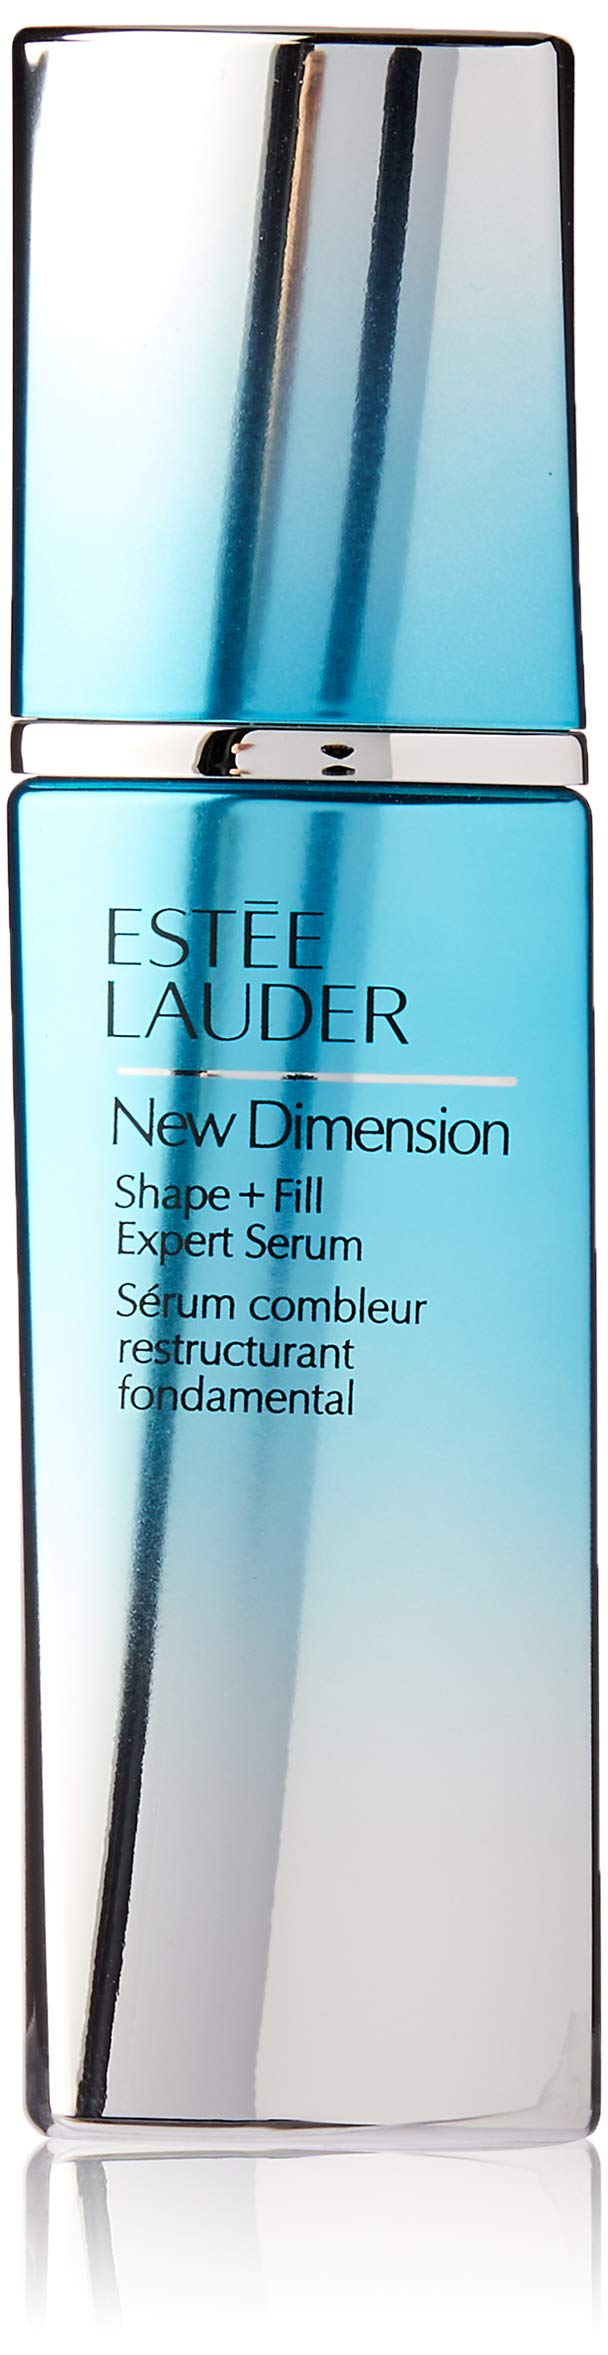 Estee Lauder New Dimension Shape and Fill Expert Serum, 1 Ounce